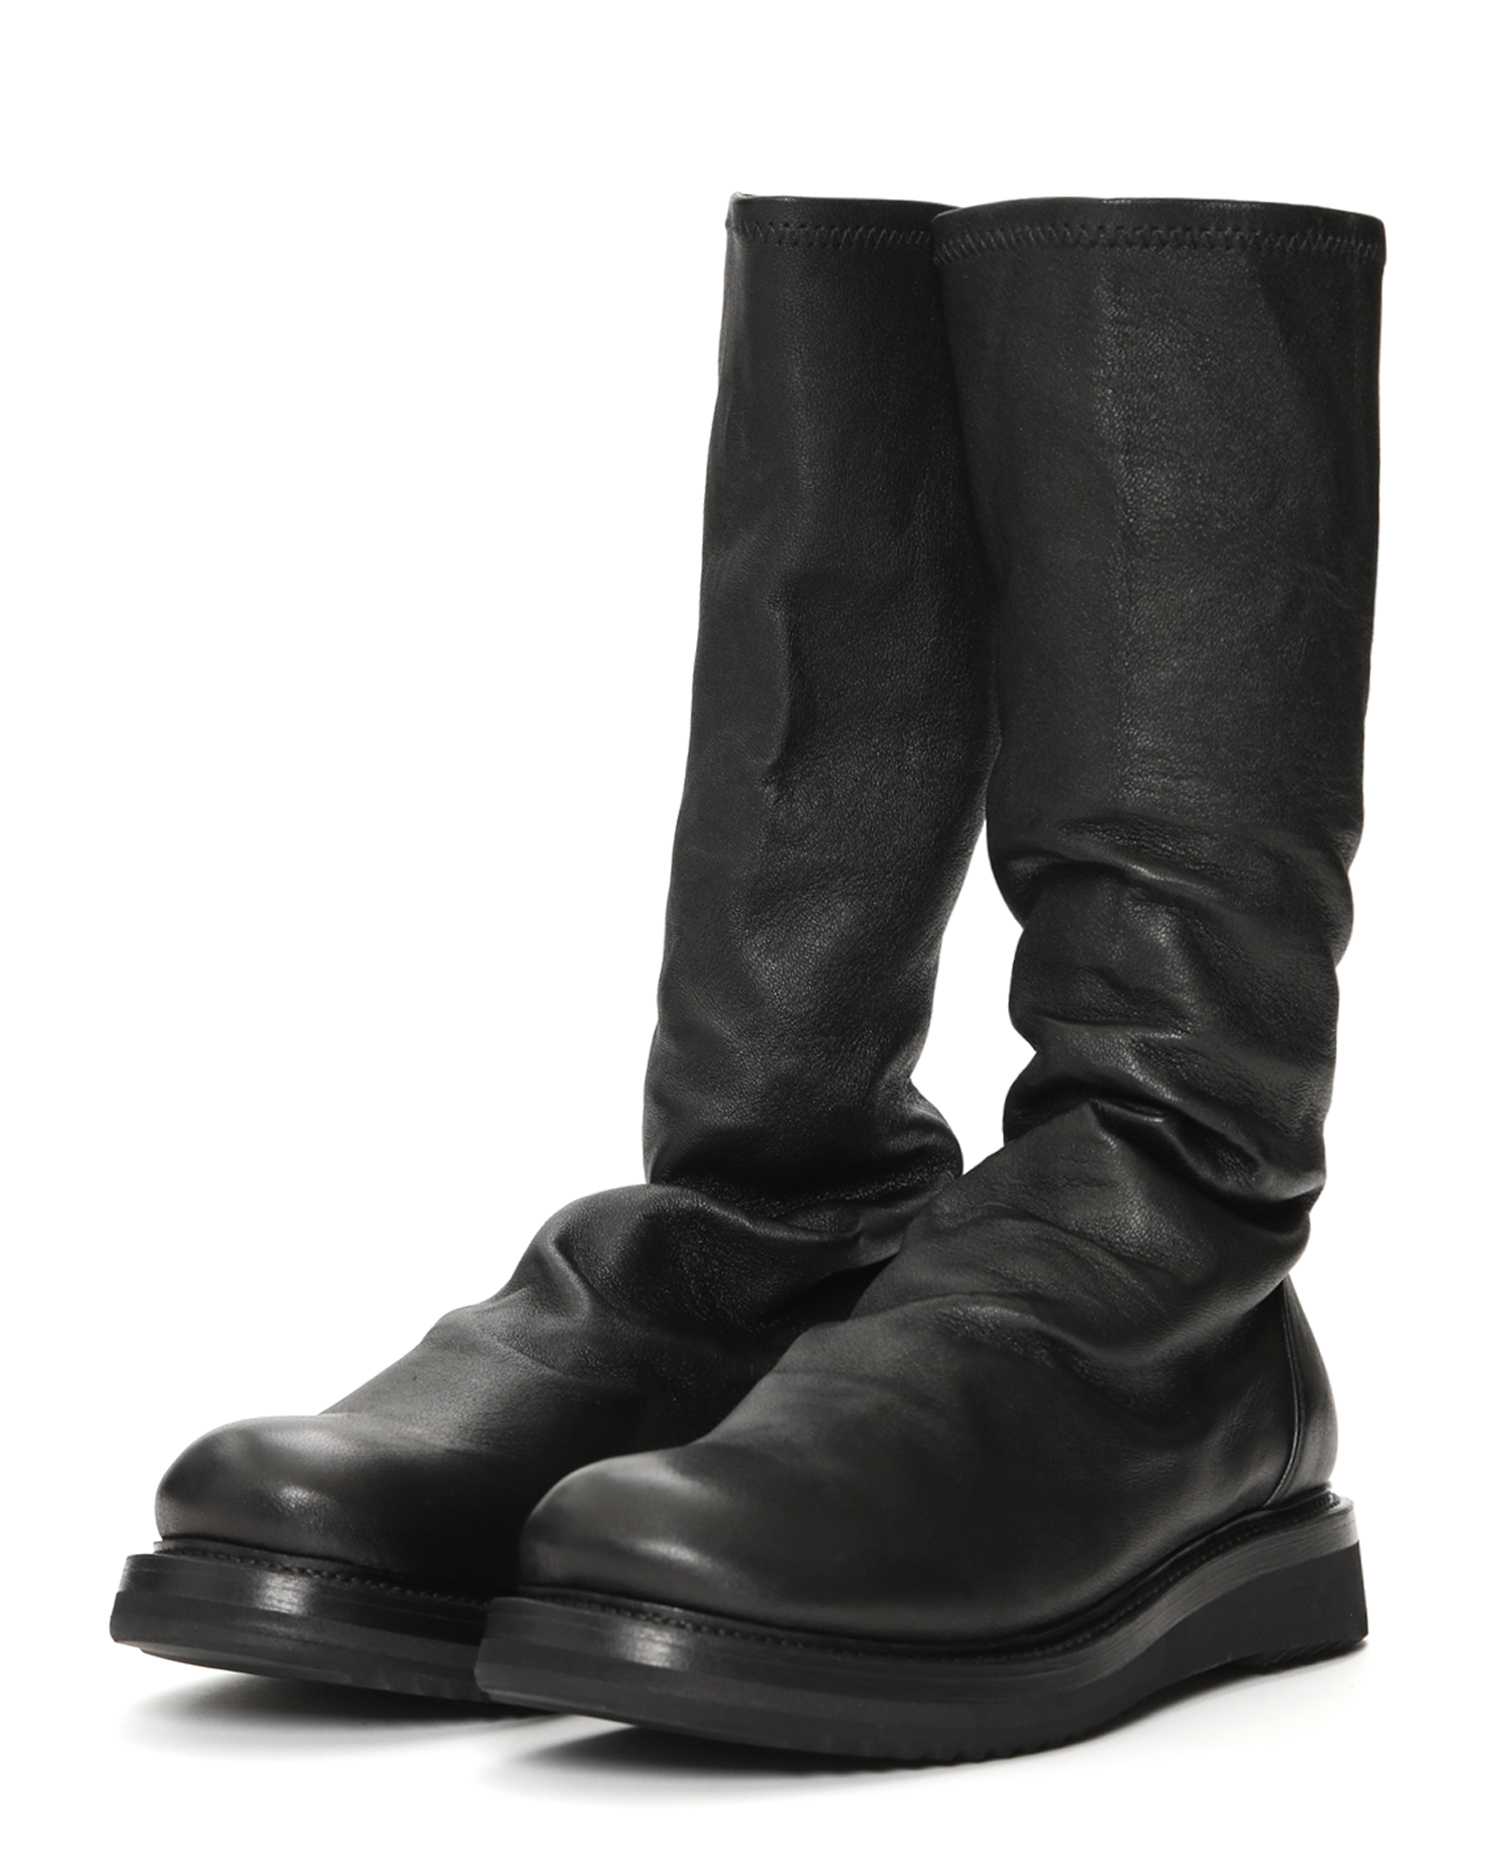 Sisyphus Leather Sock Boots